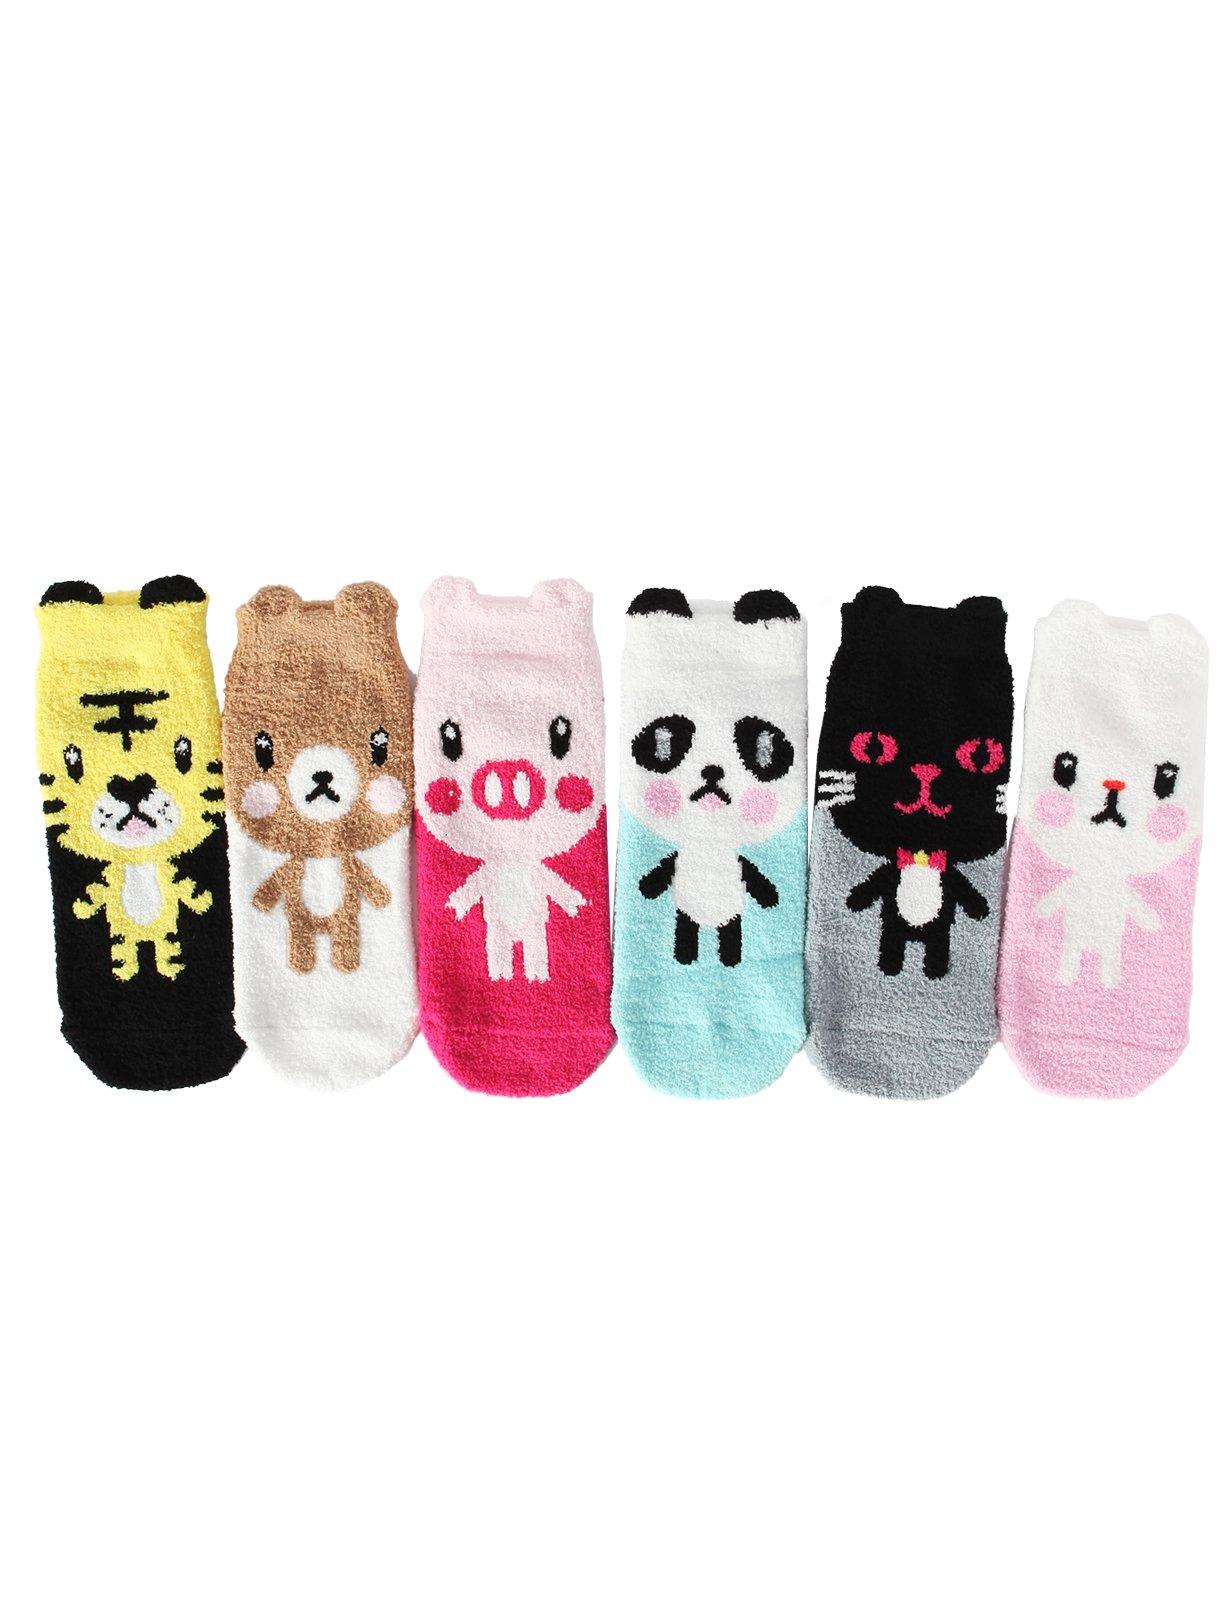 OSABASA 6 Pairs Pack Super Soft Cozy Fuzzy Winter Slipper Socks(KWMS0139)